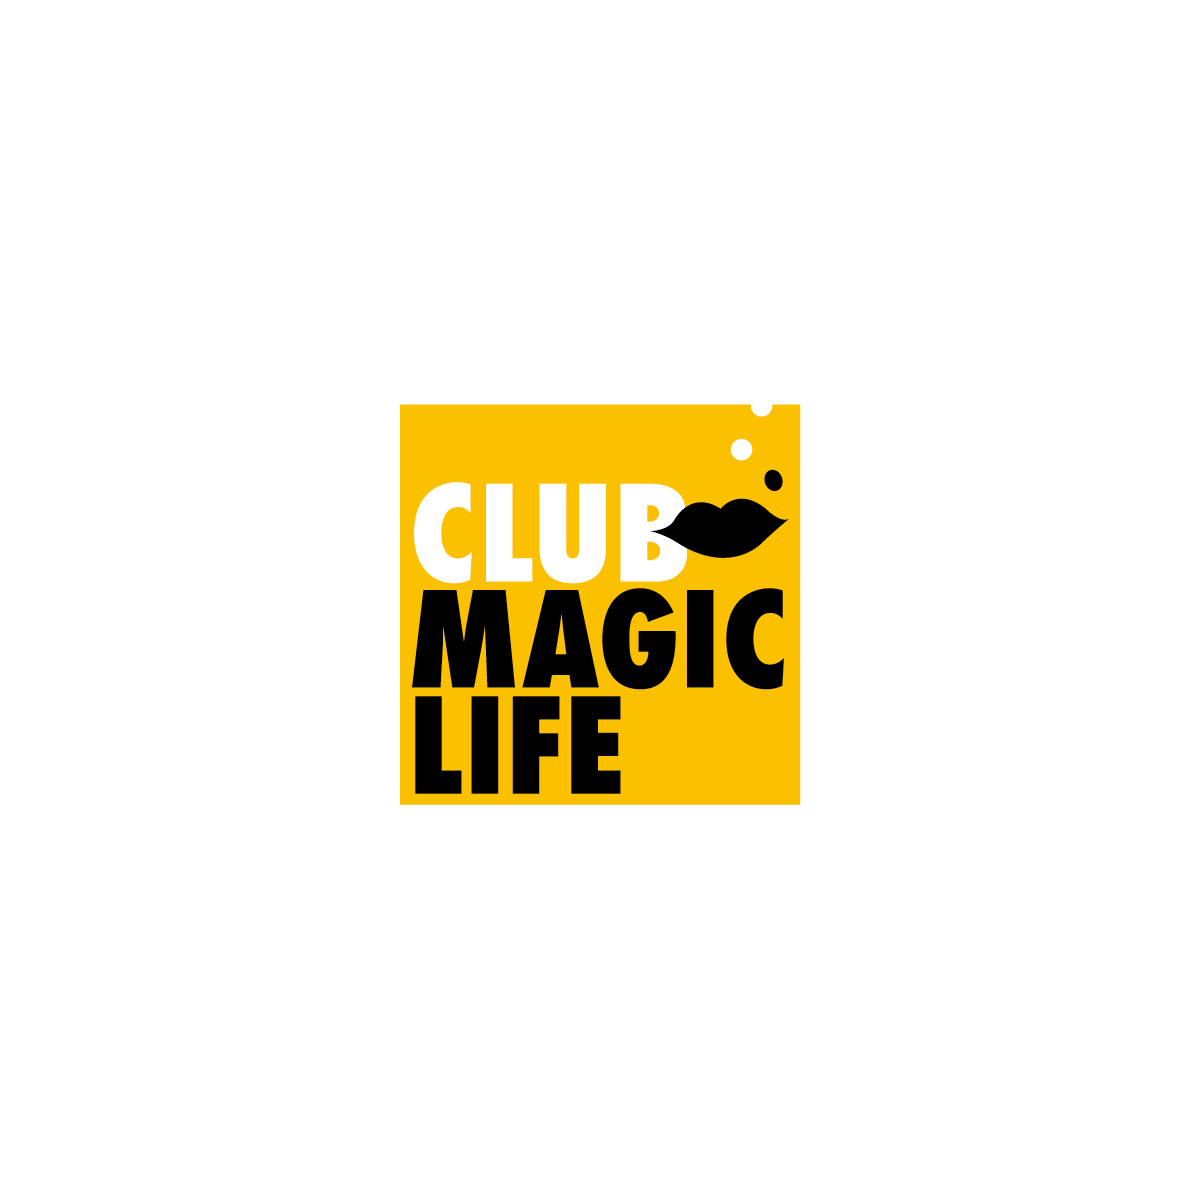 Club Magic Life Logo